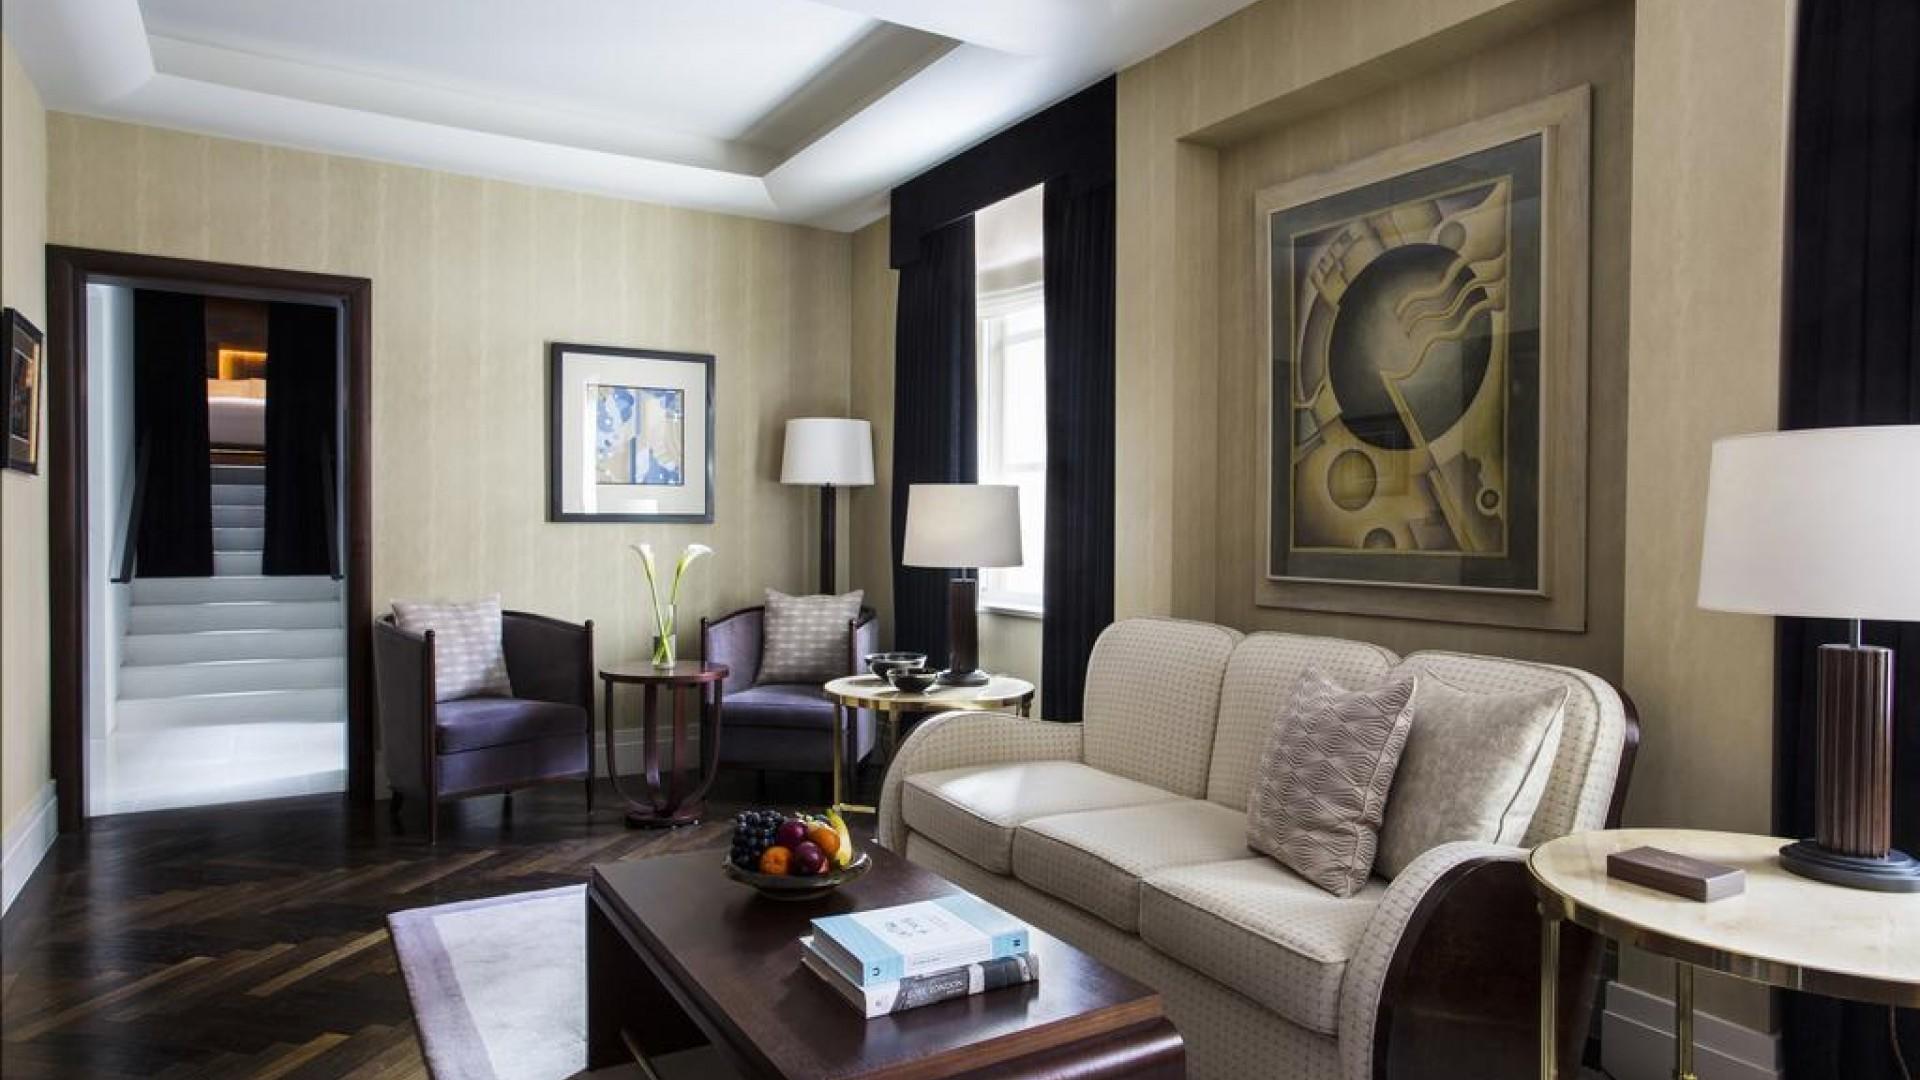 Beaumont Hotel, ROOM by Antony Gormley – London's best designer hotel suites